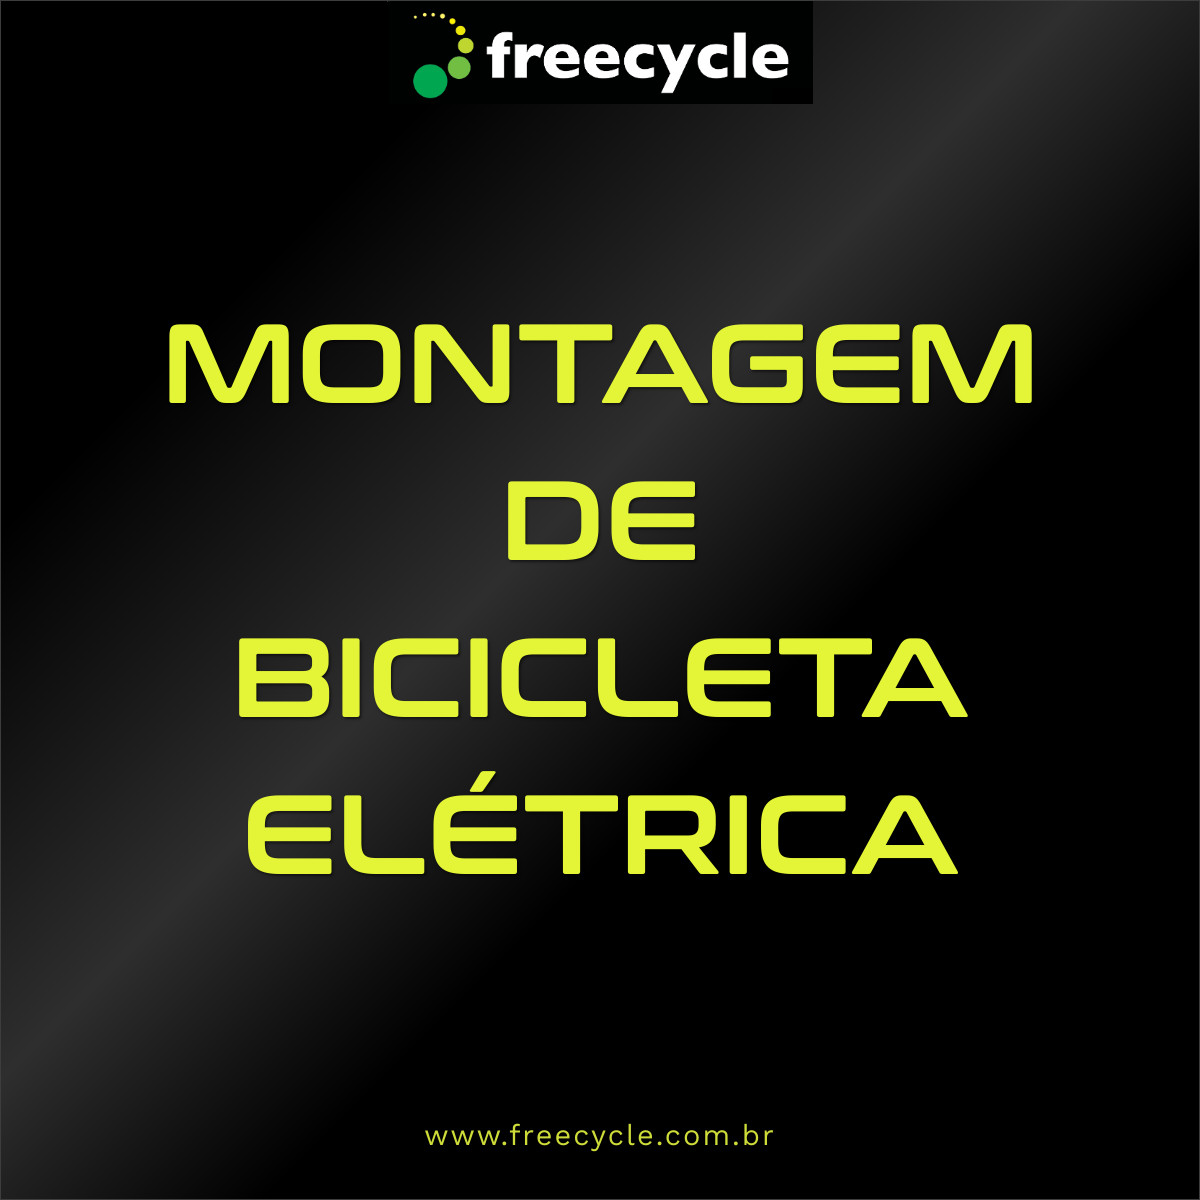 Montagem de Bicicleta Elétrica